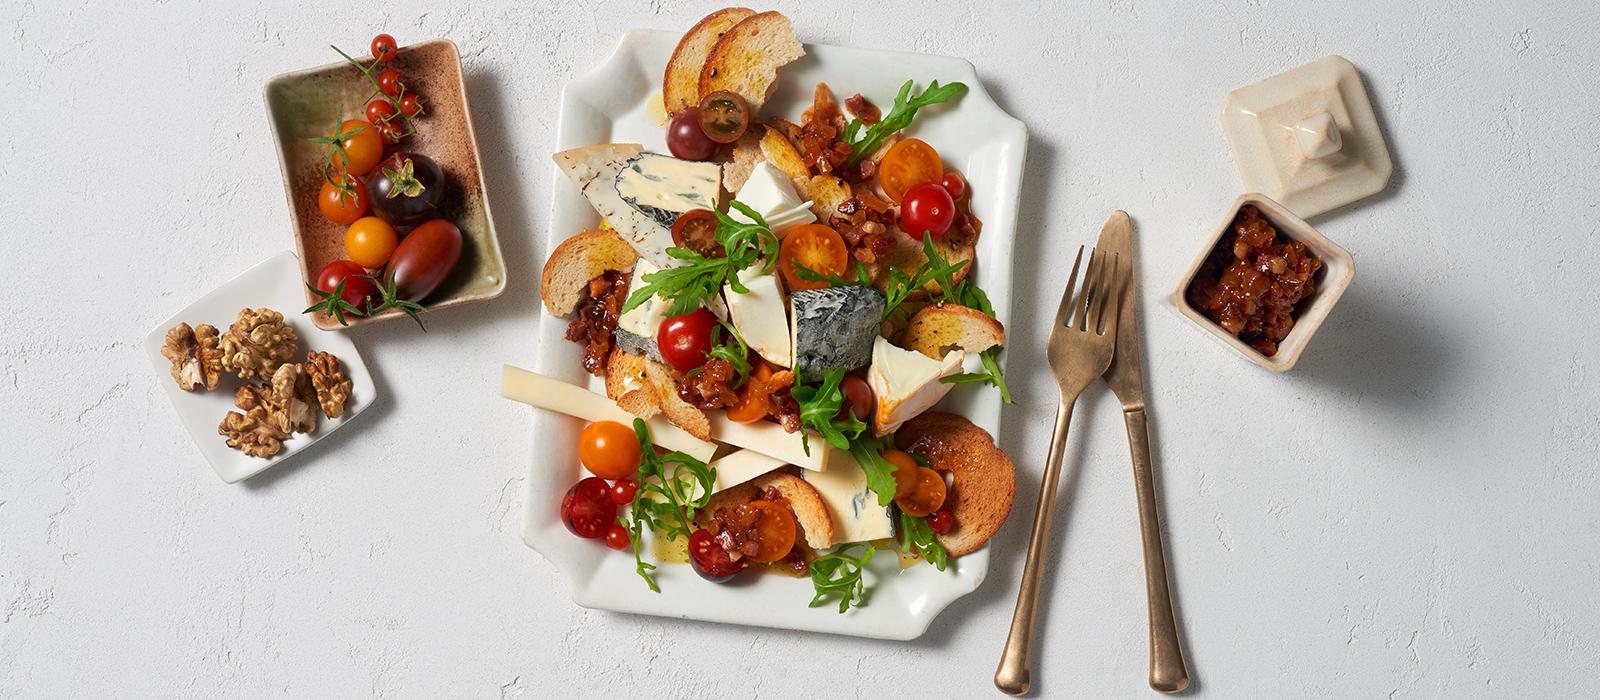 Käse-Brotsalat mit Speck-Vinaigrette